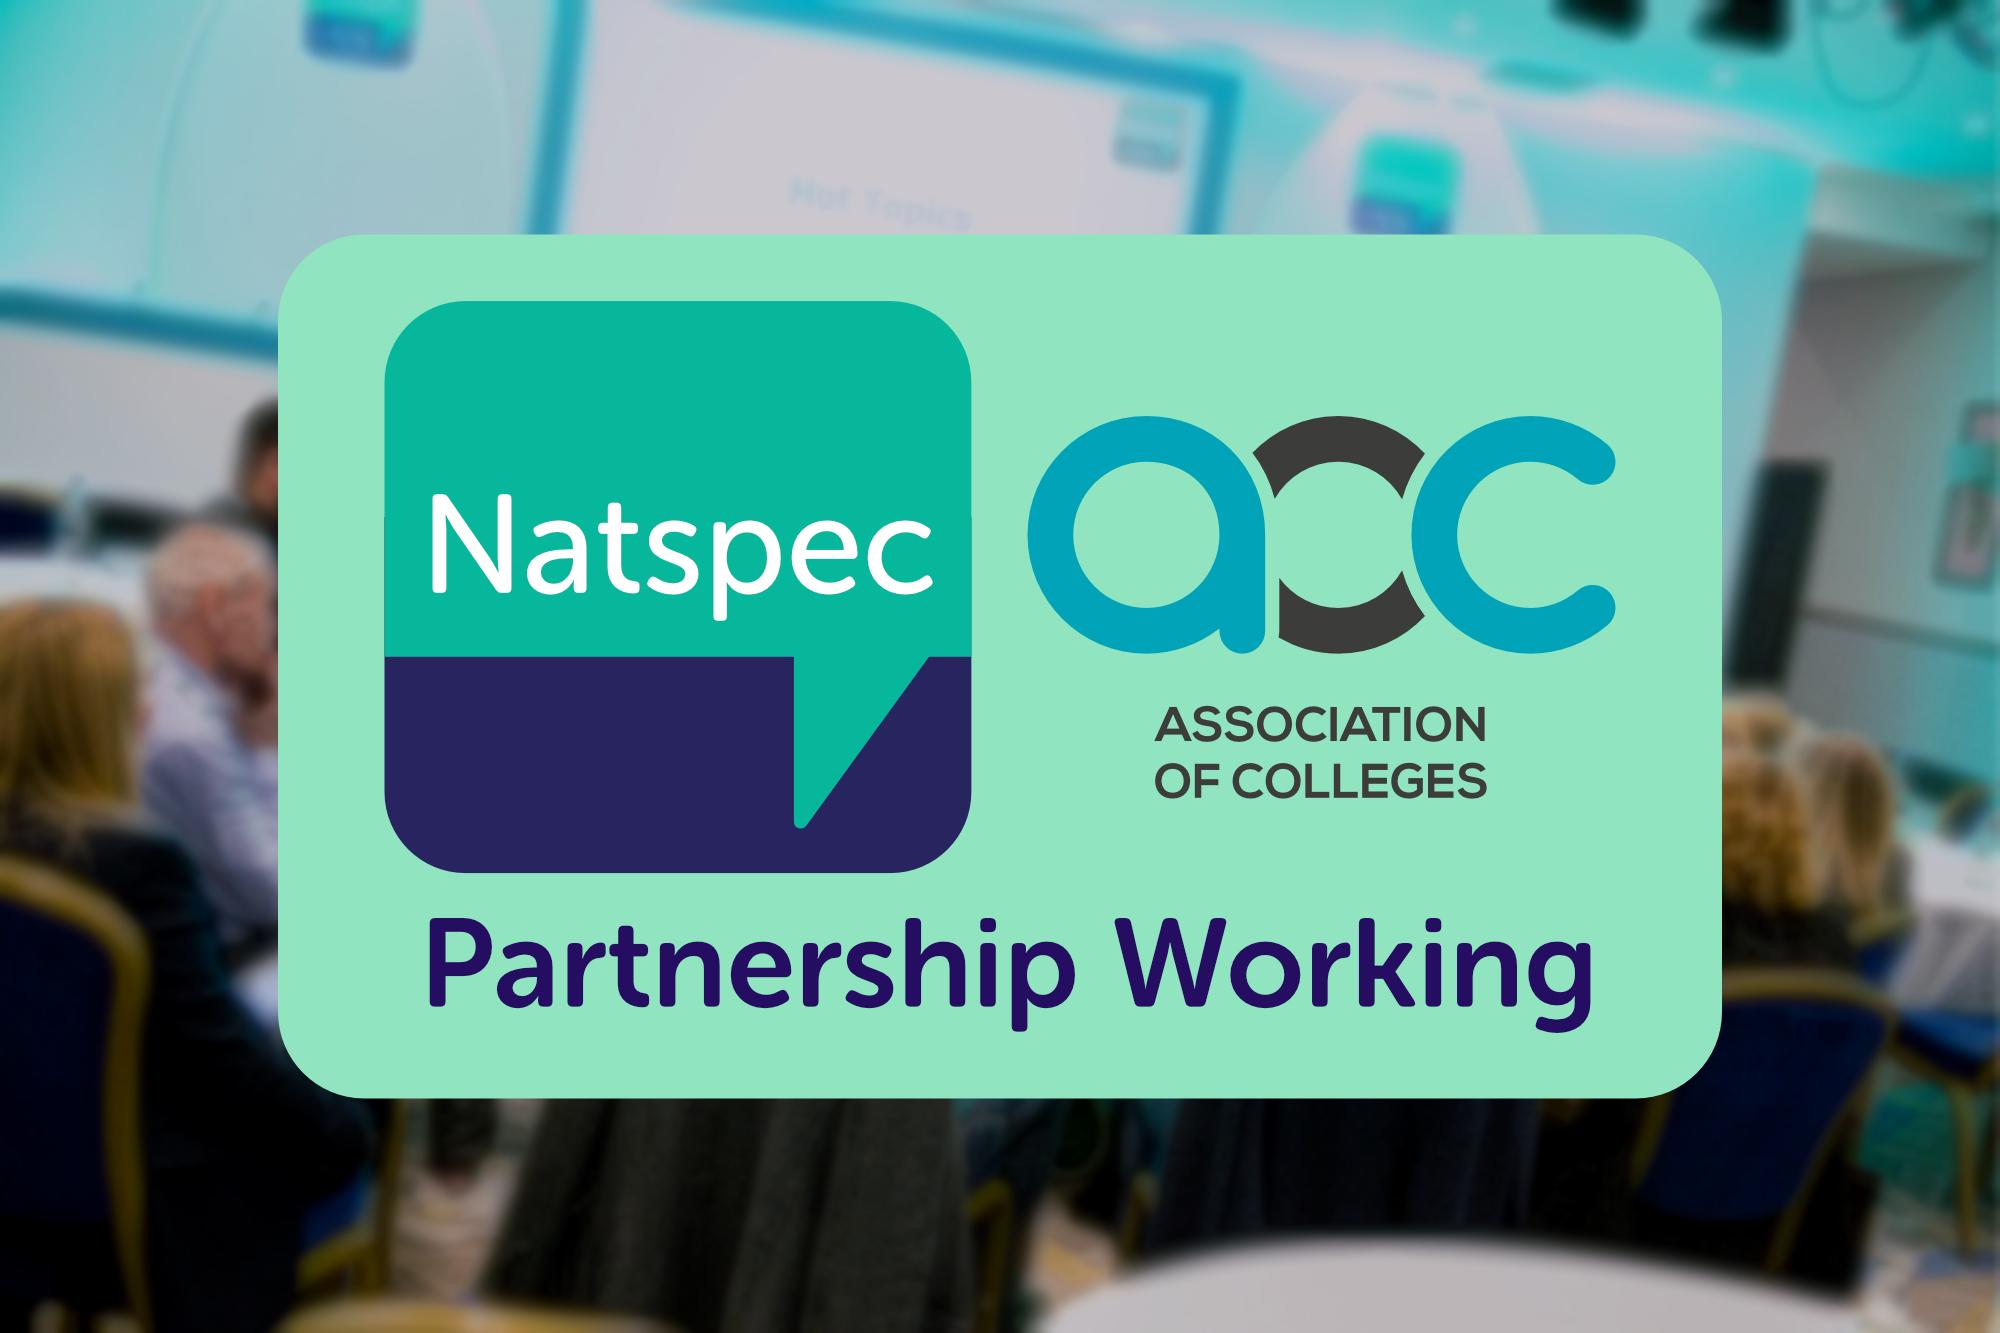 Natspec & AoC: Partnership Working